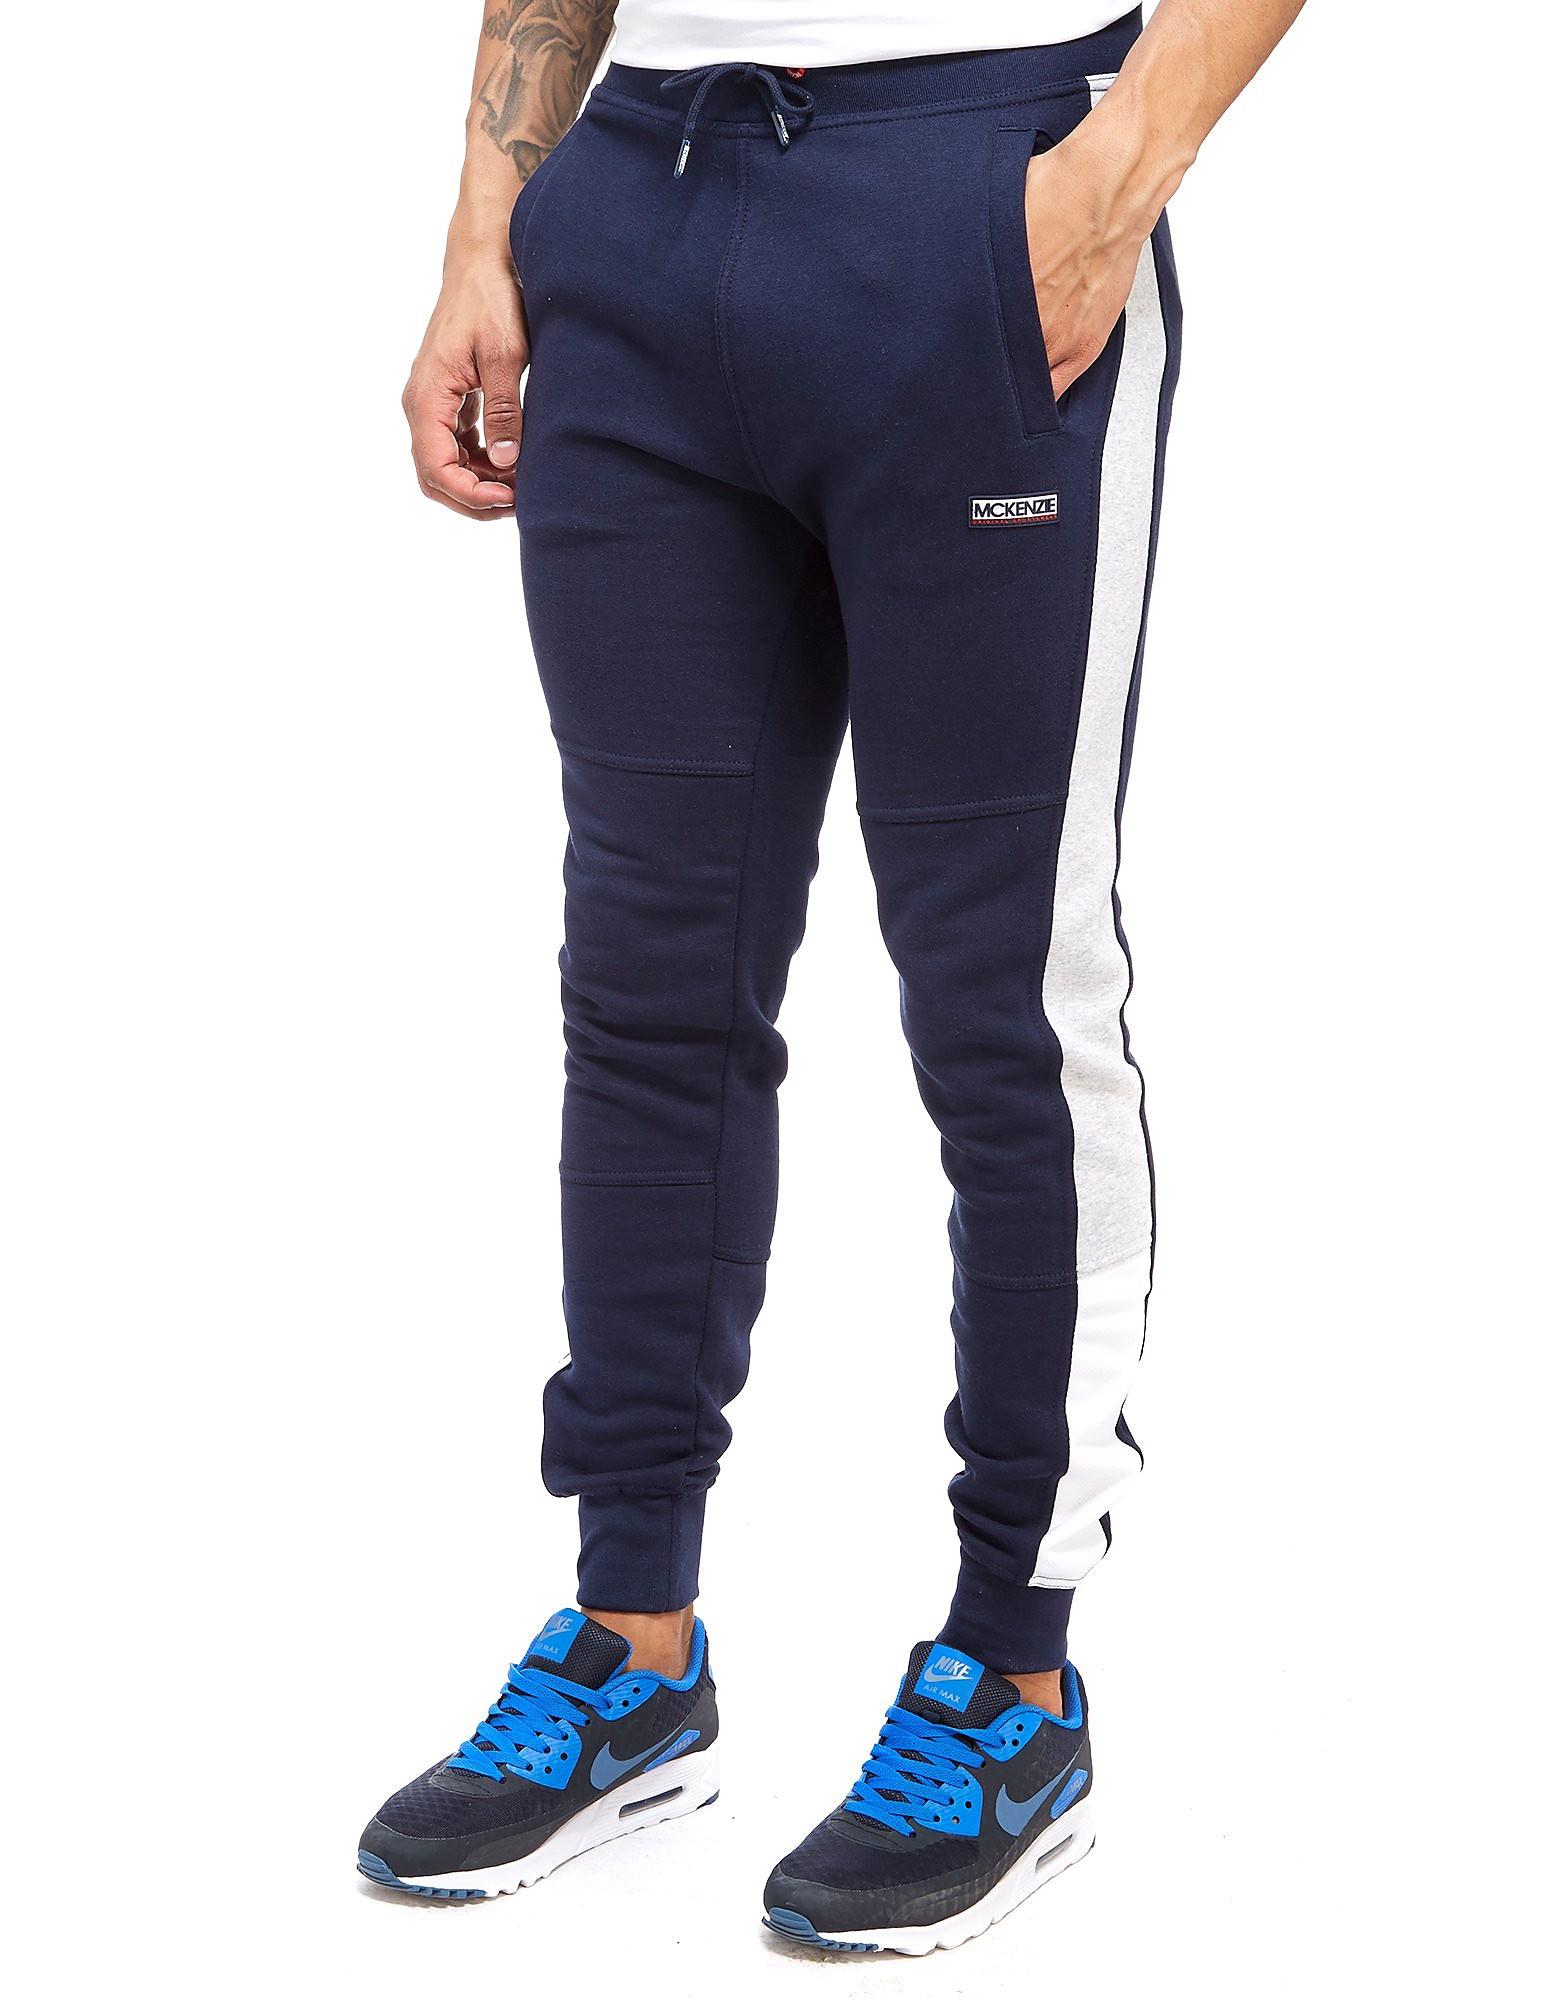 McKenzie Islington Fleece Pants